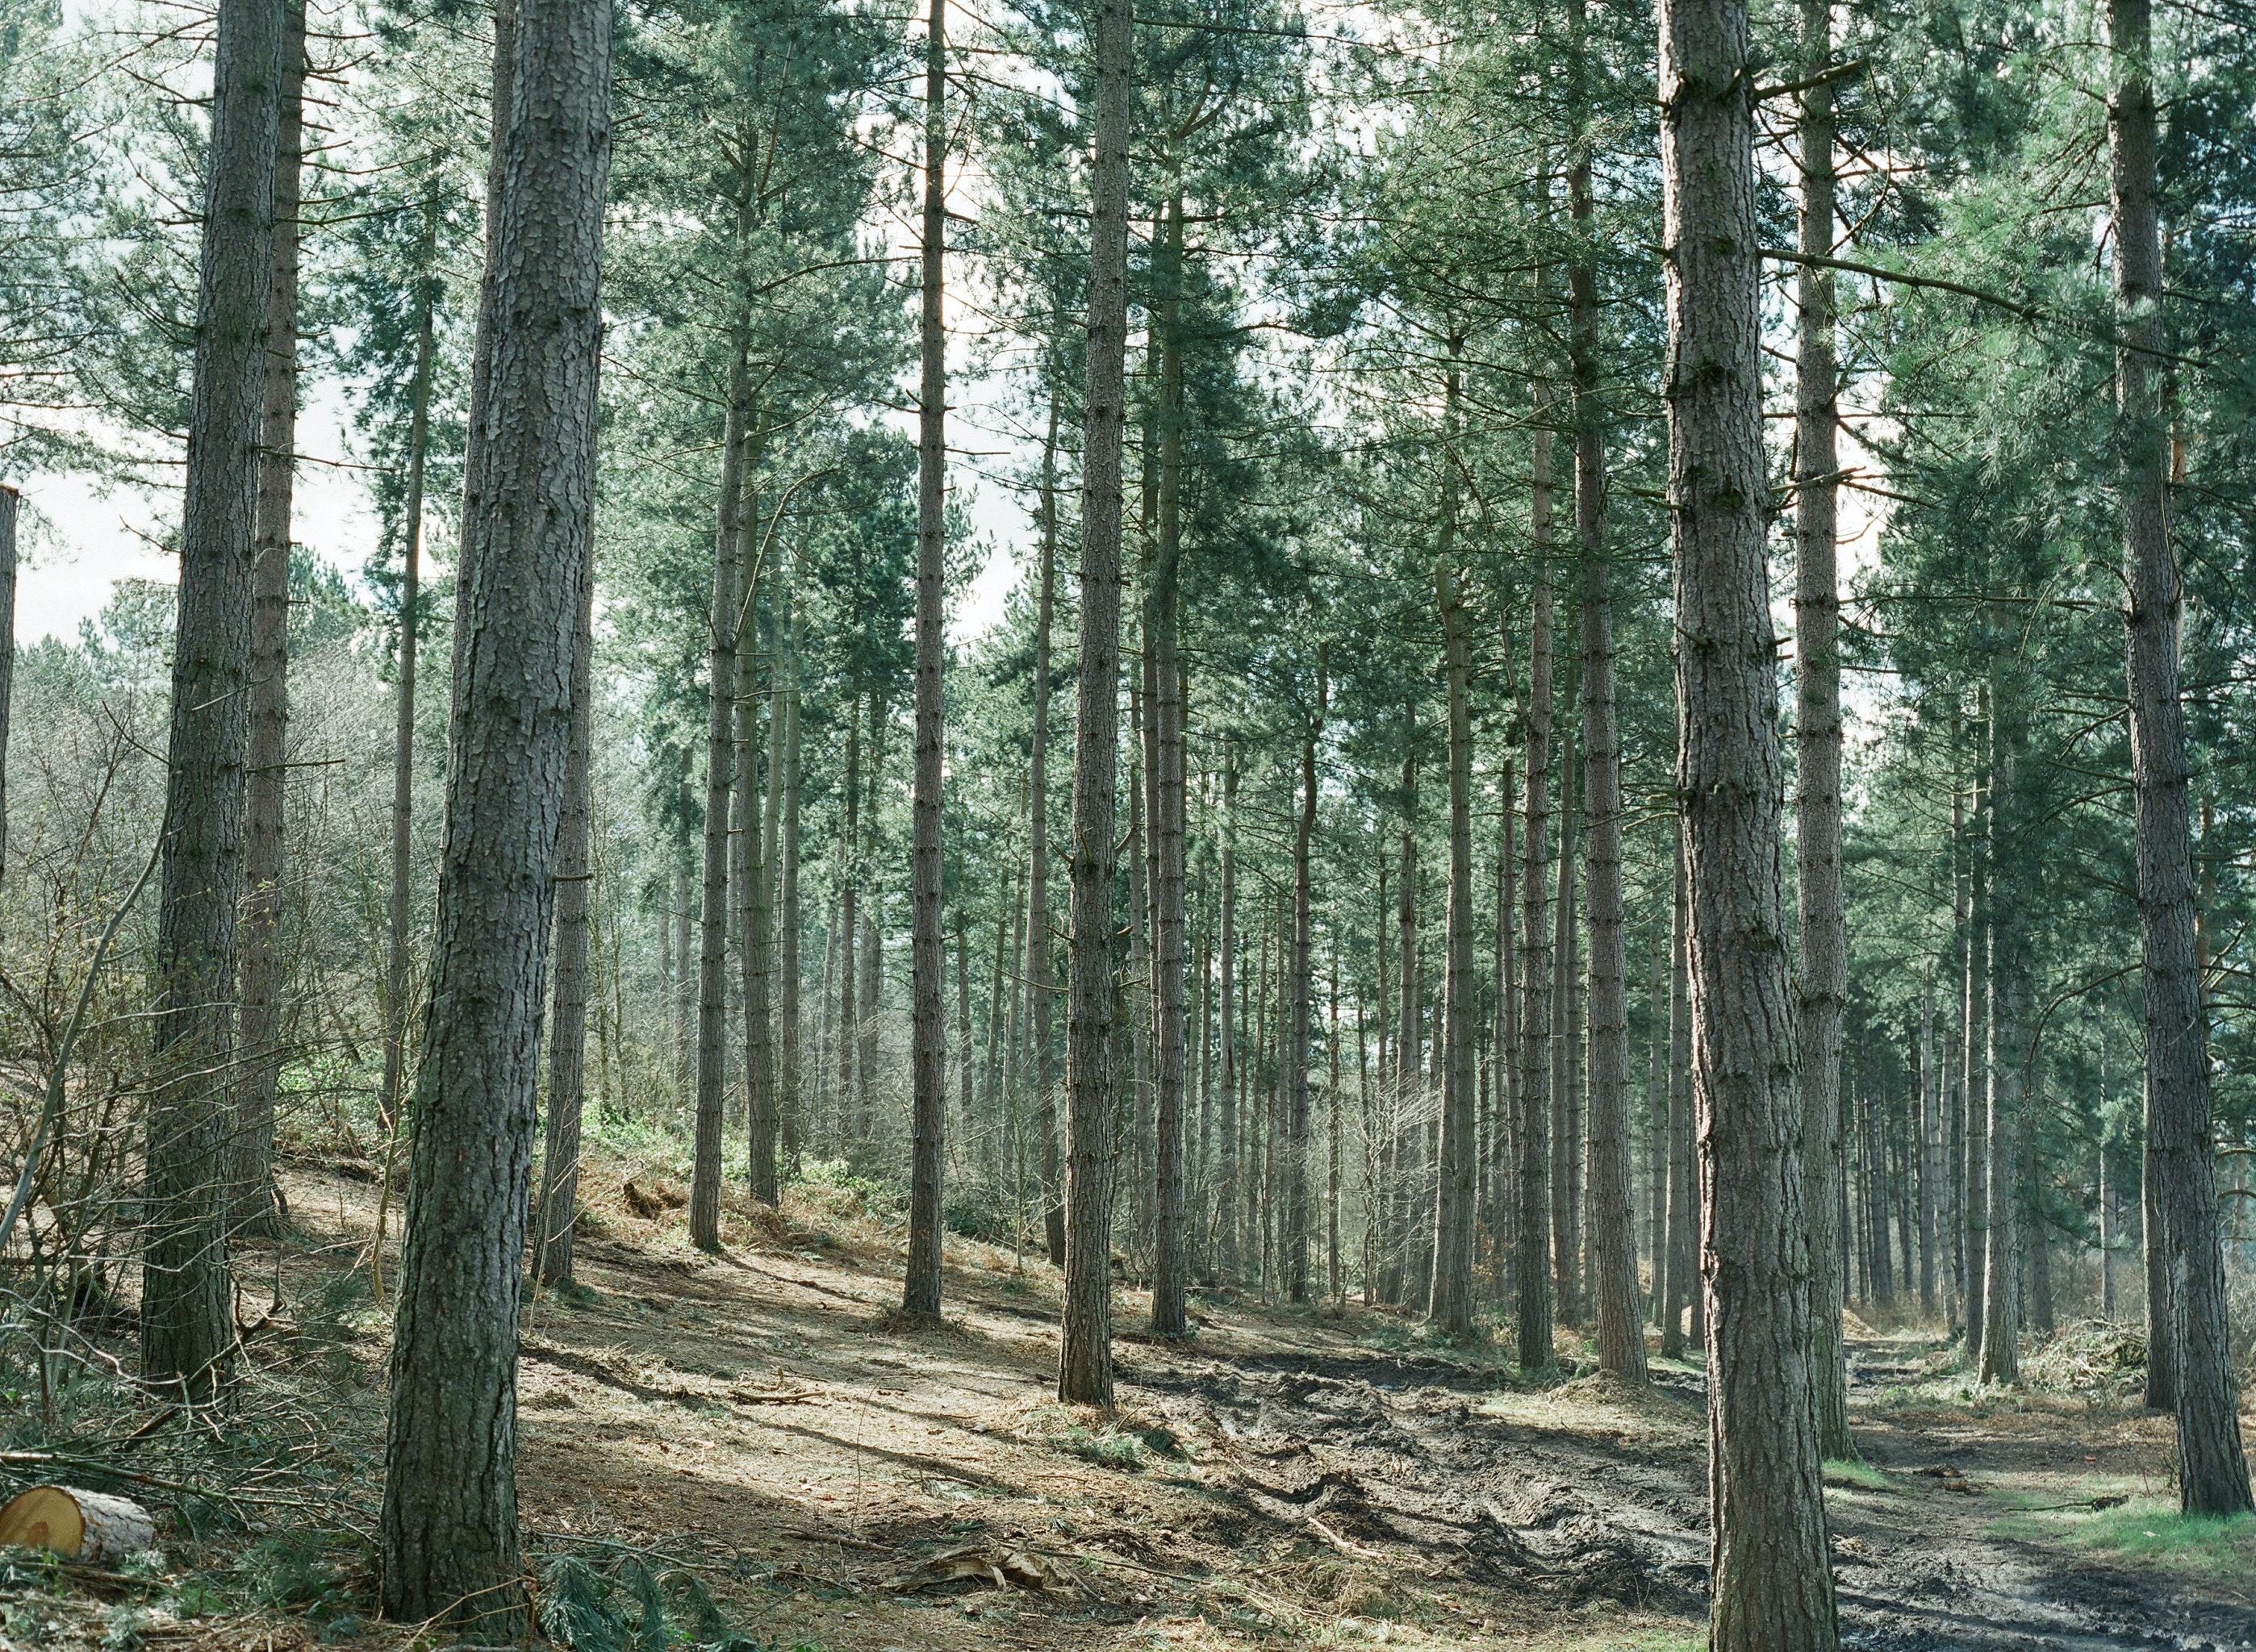 brown dirt road between green leaved trees during daytime